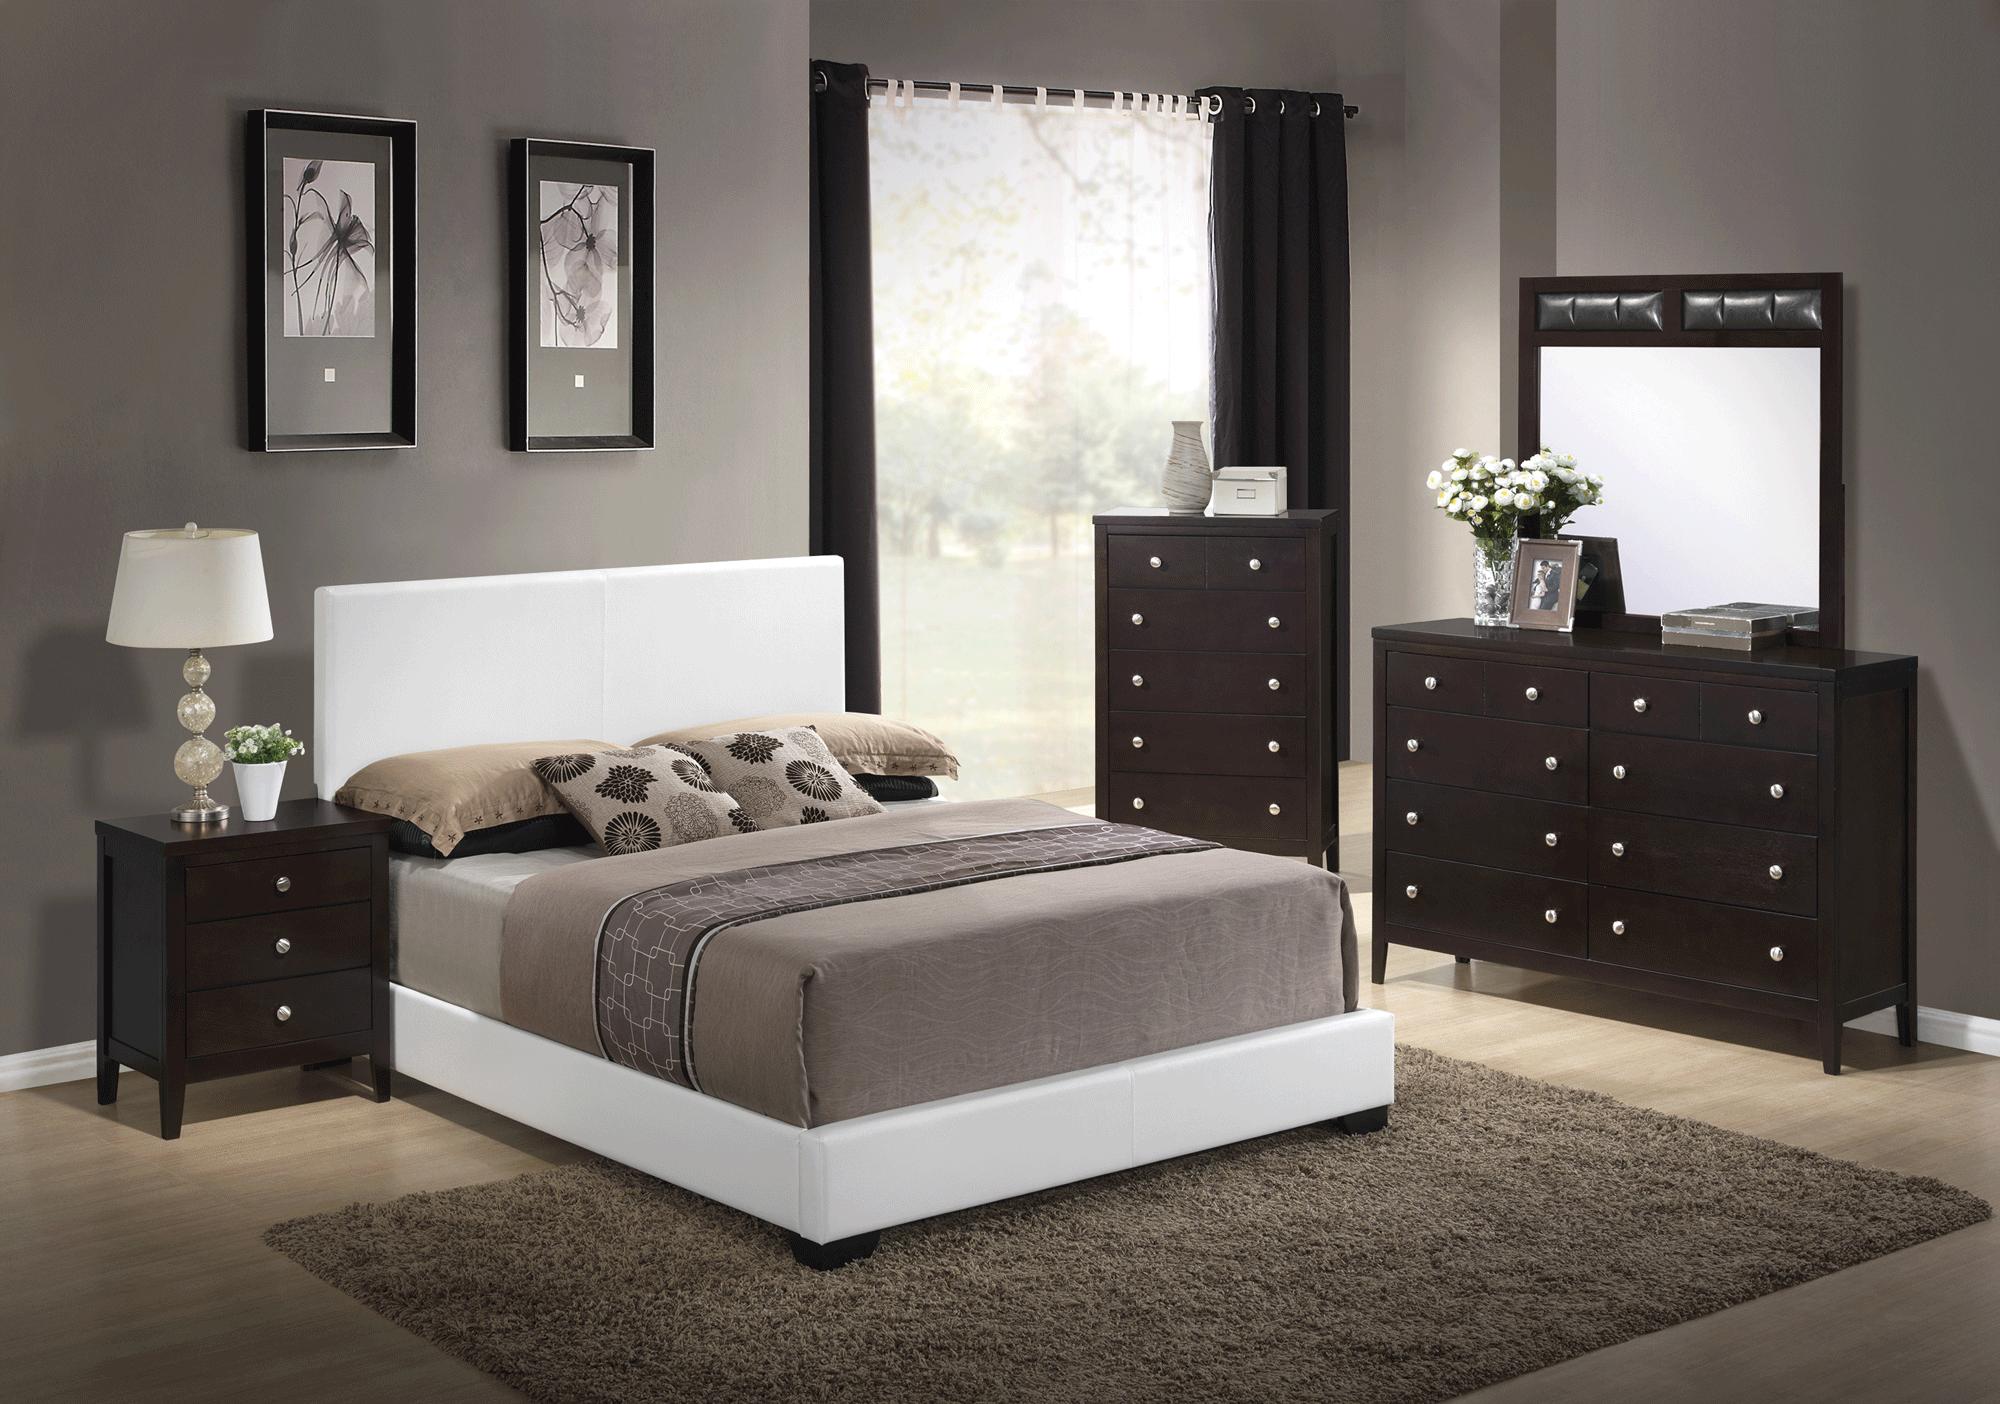 Rosa Antique Black Bedroom Set (w/8103 White PU Bed) by Global Furniture